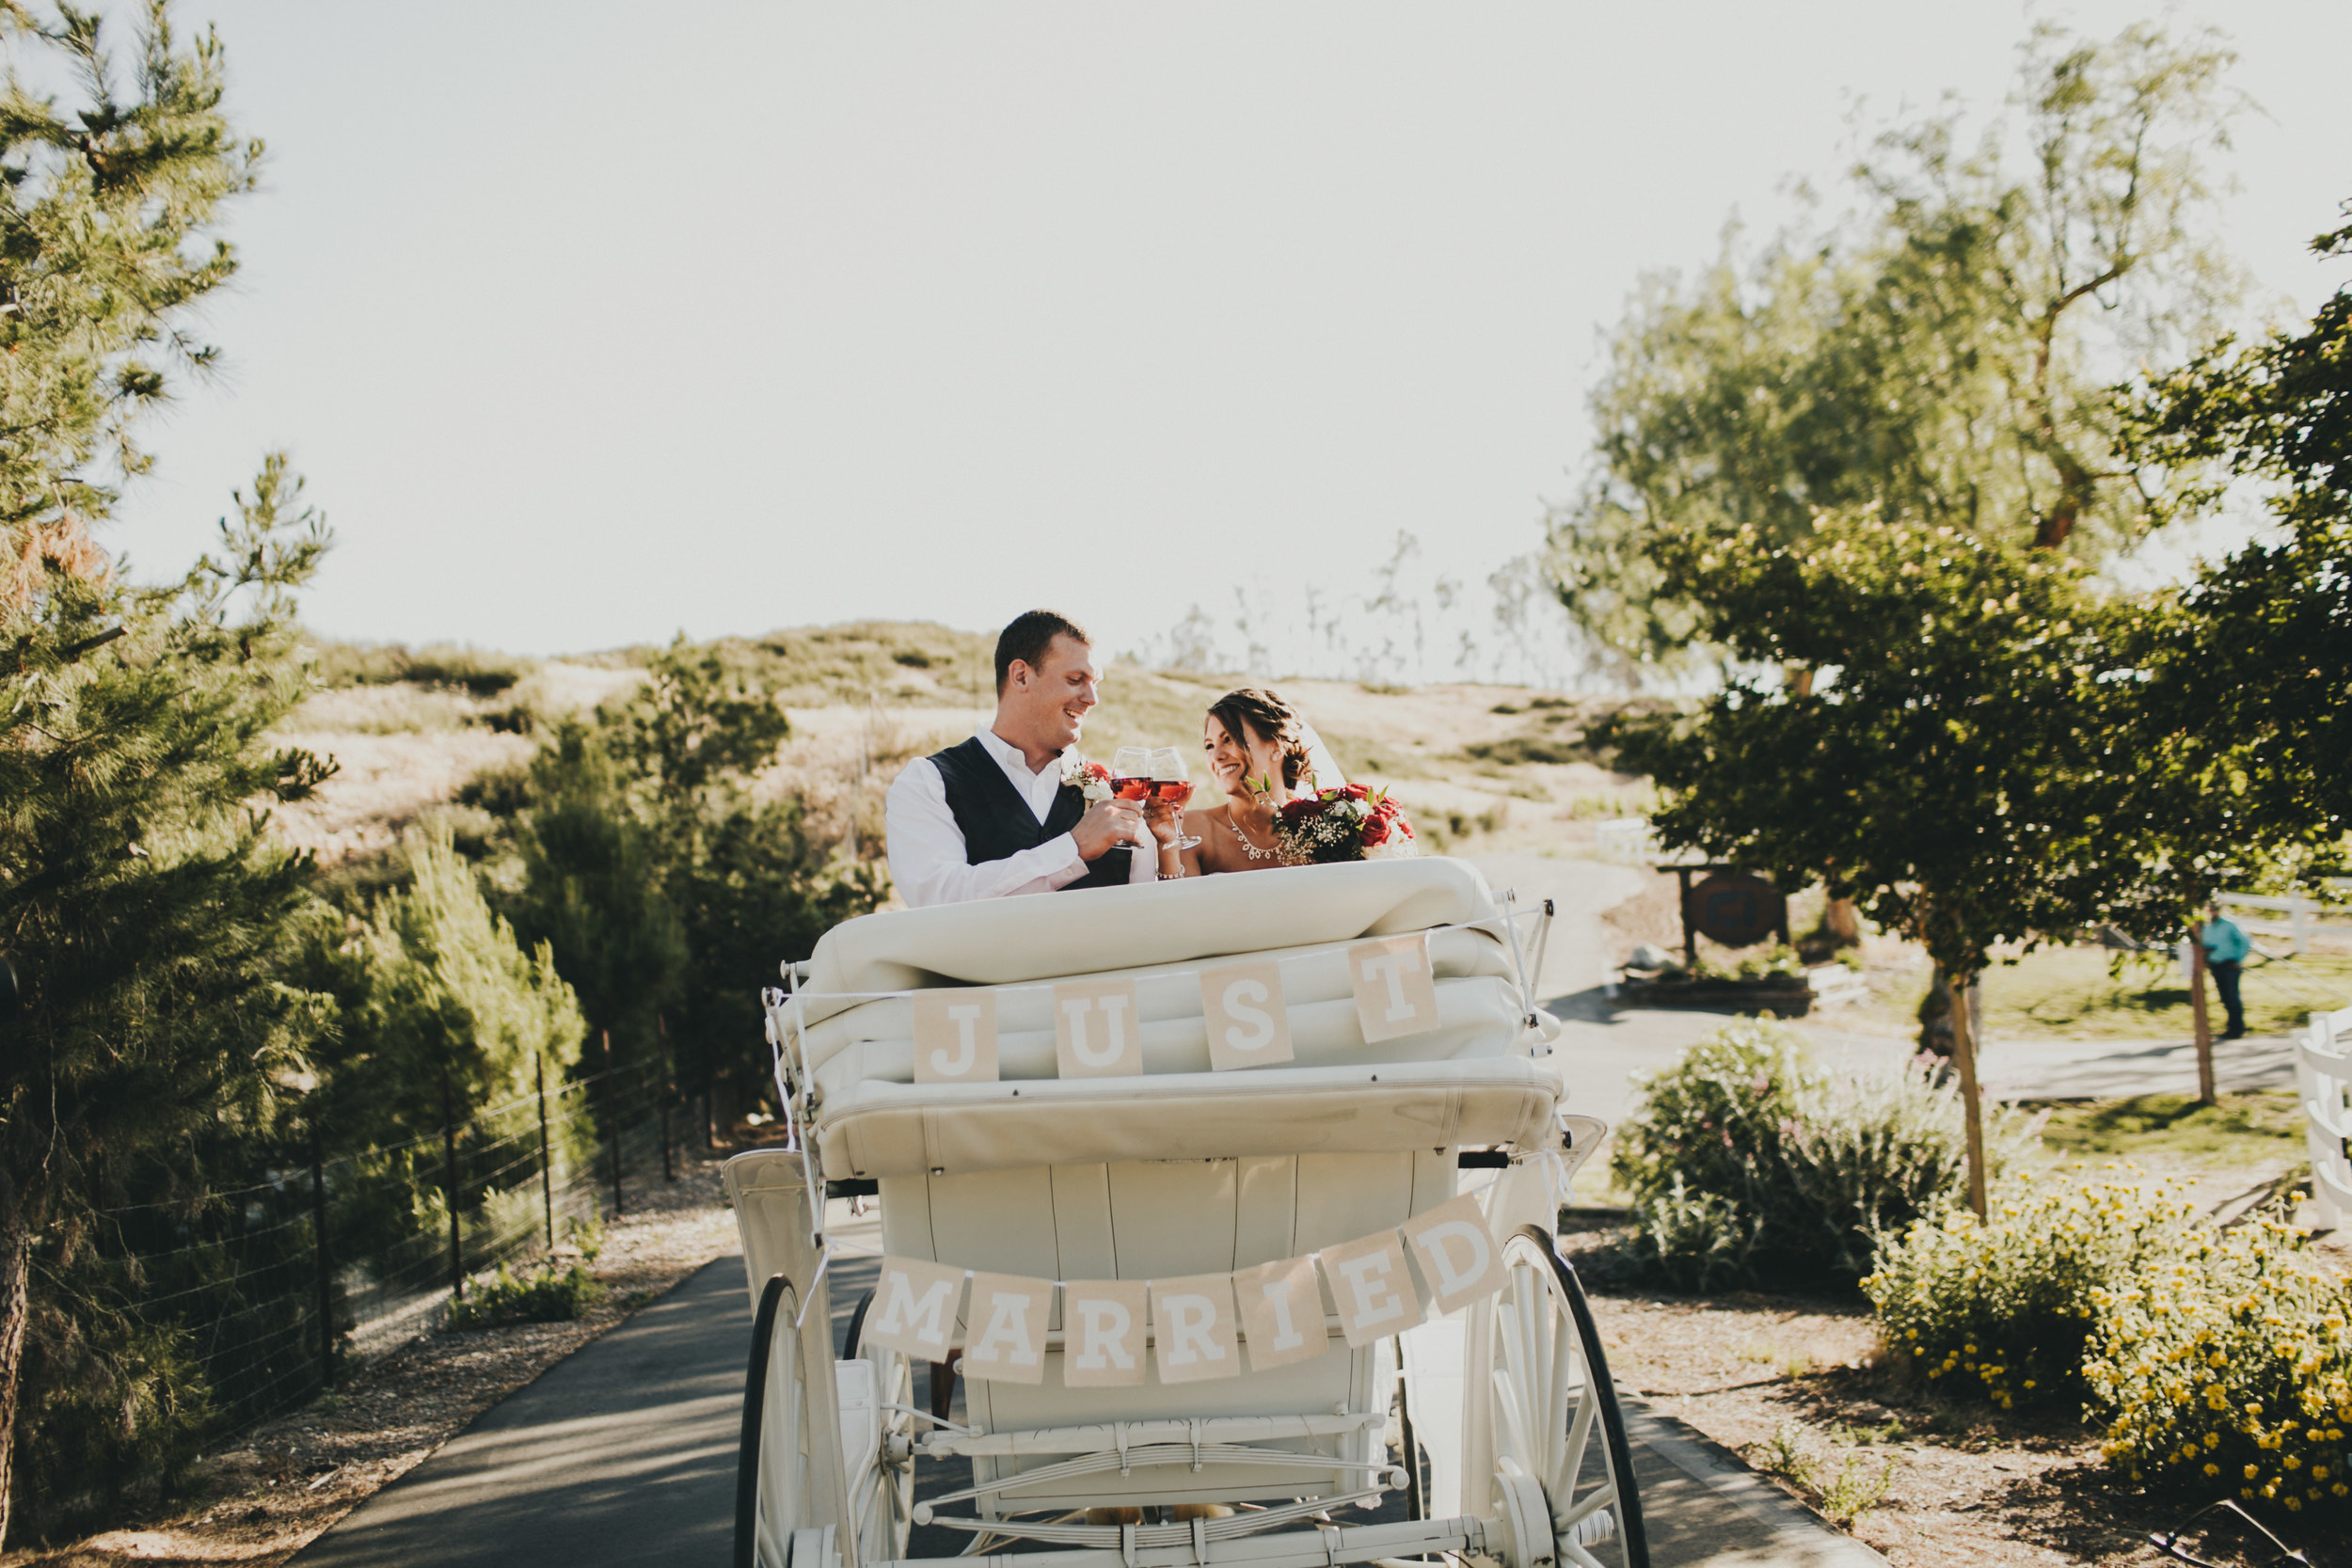 Cheyenne + Jordan - Wedding, Natalie Griffo (68 of 157).jpg